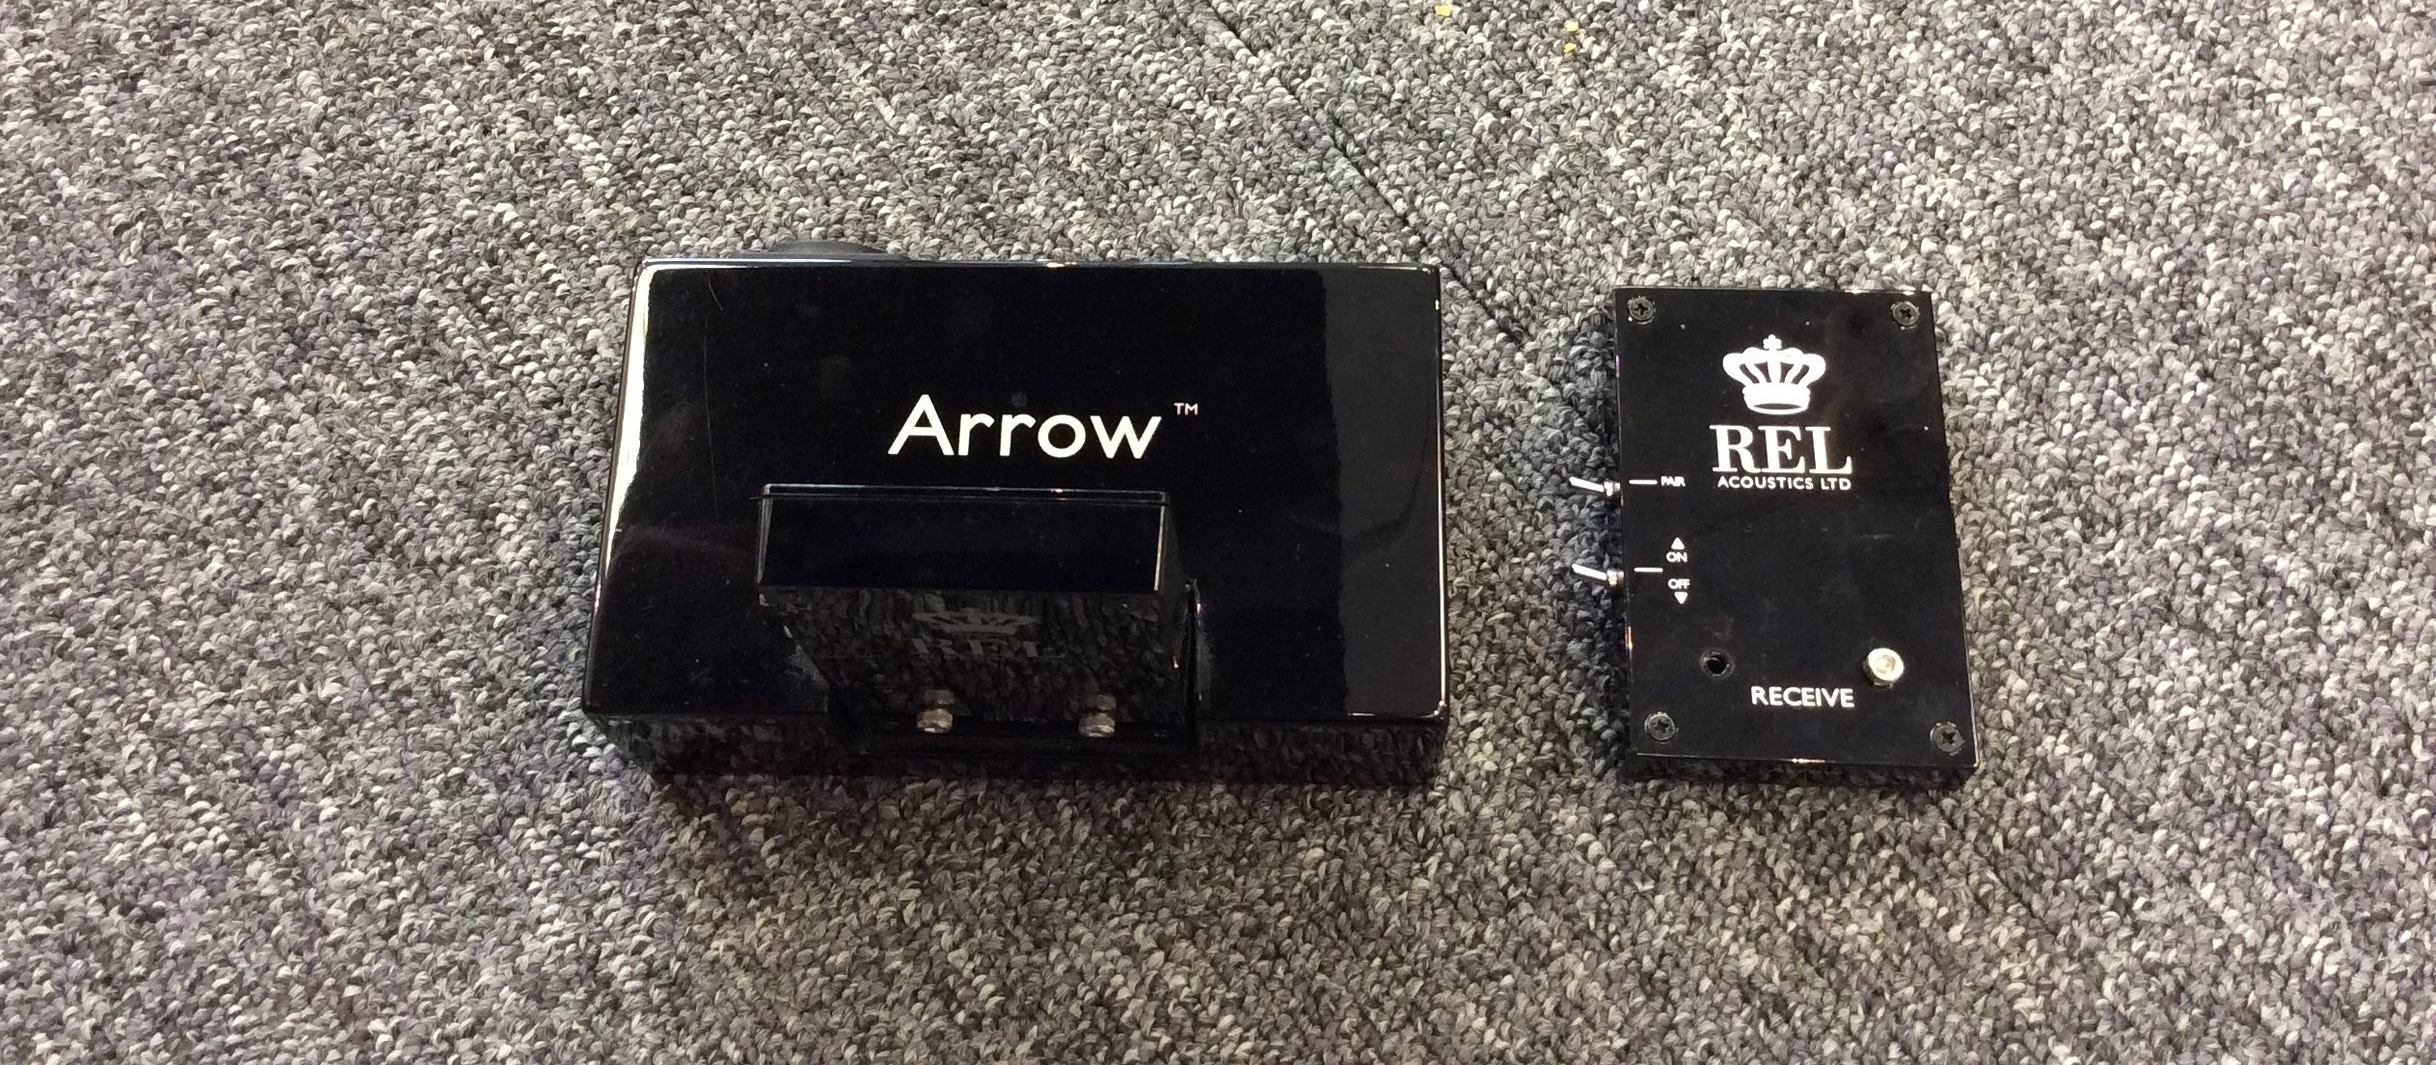 Arrow Wireless Kit for a neat set-up